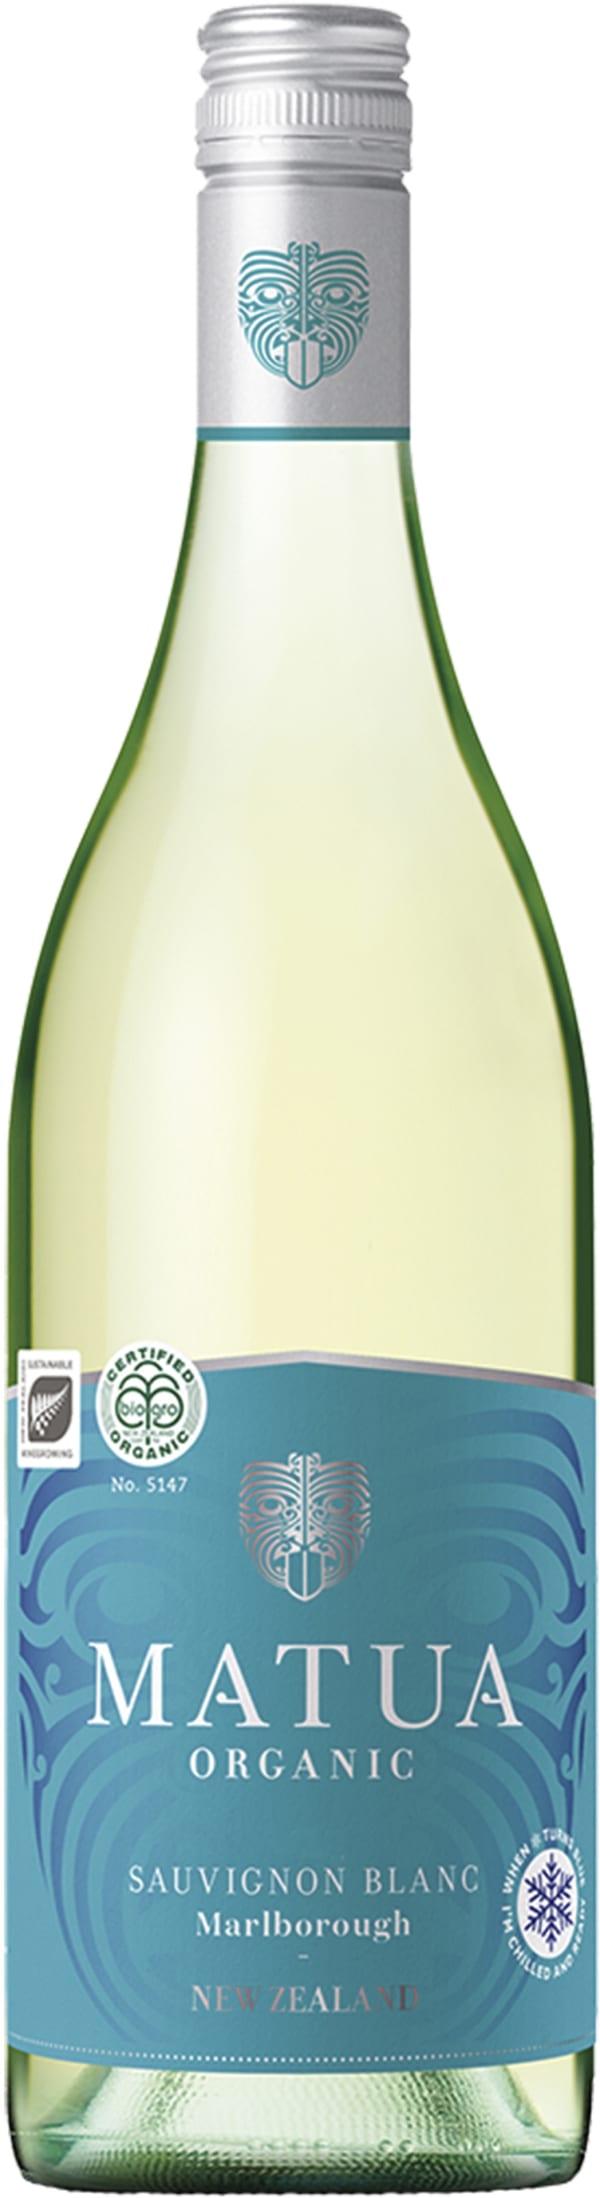 Matua Organic Sauvignon Blanc 2019